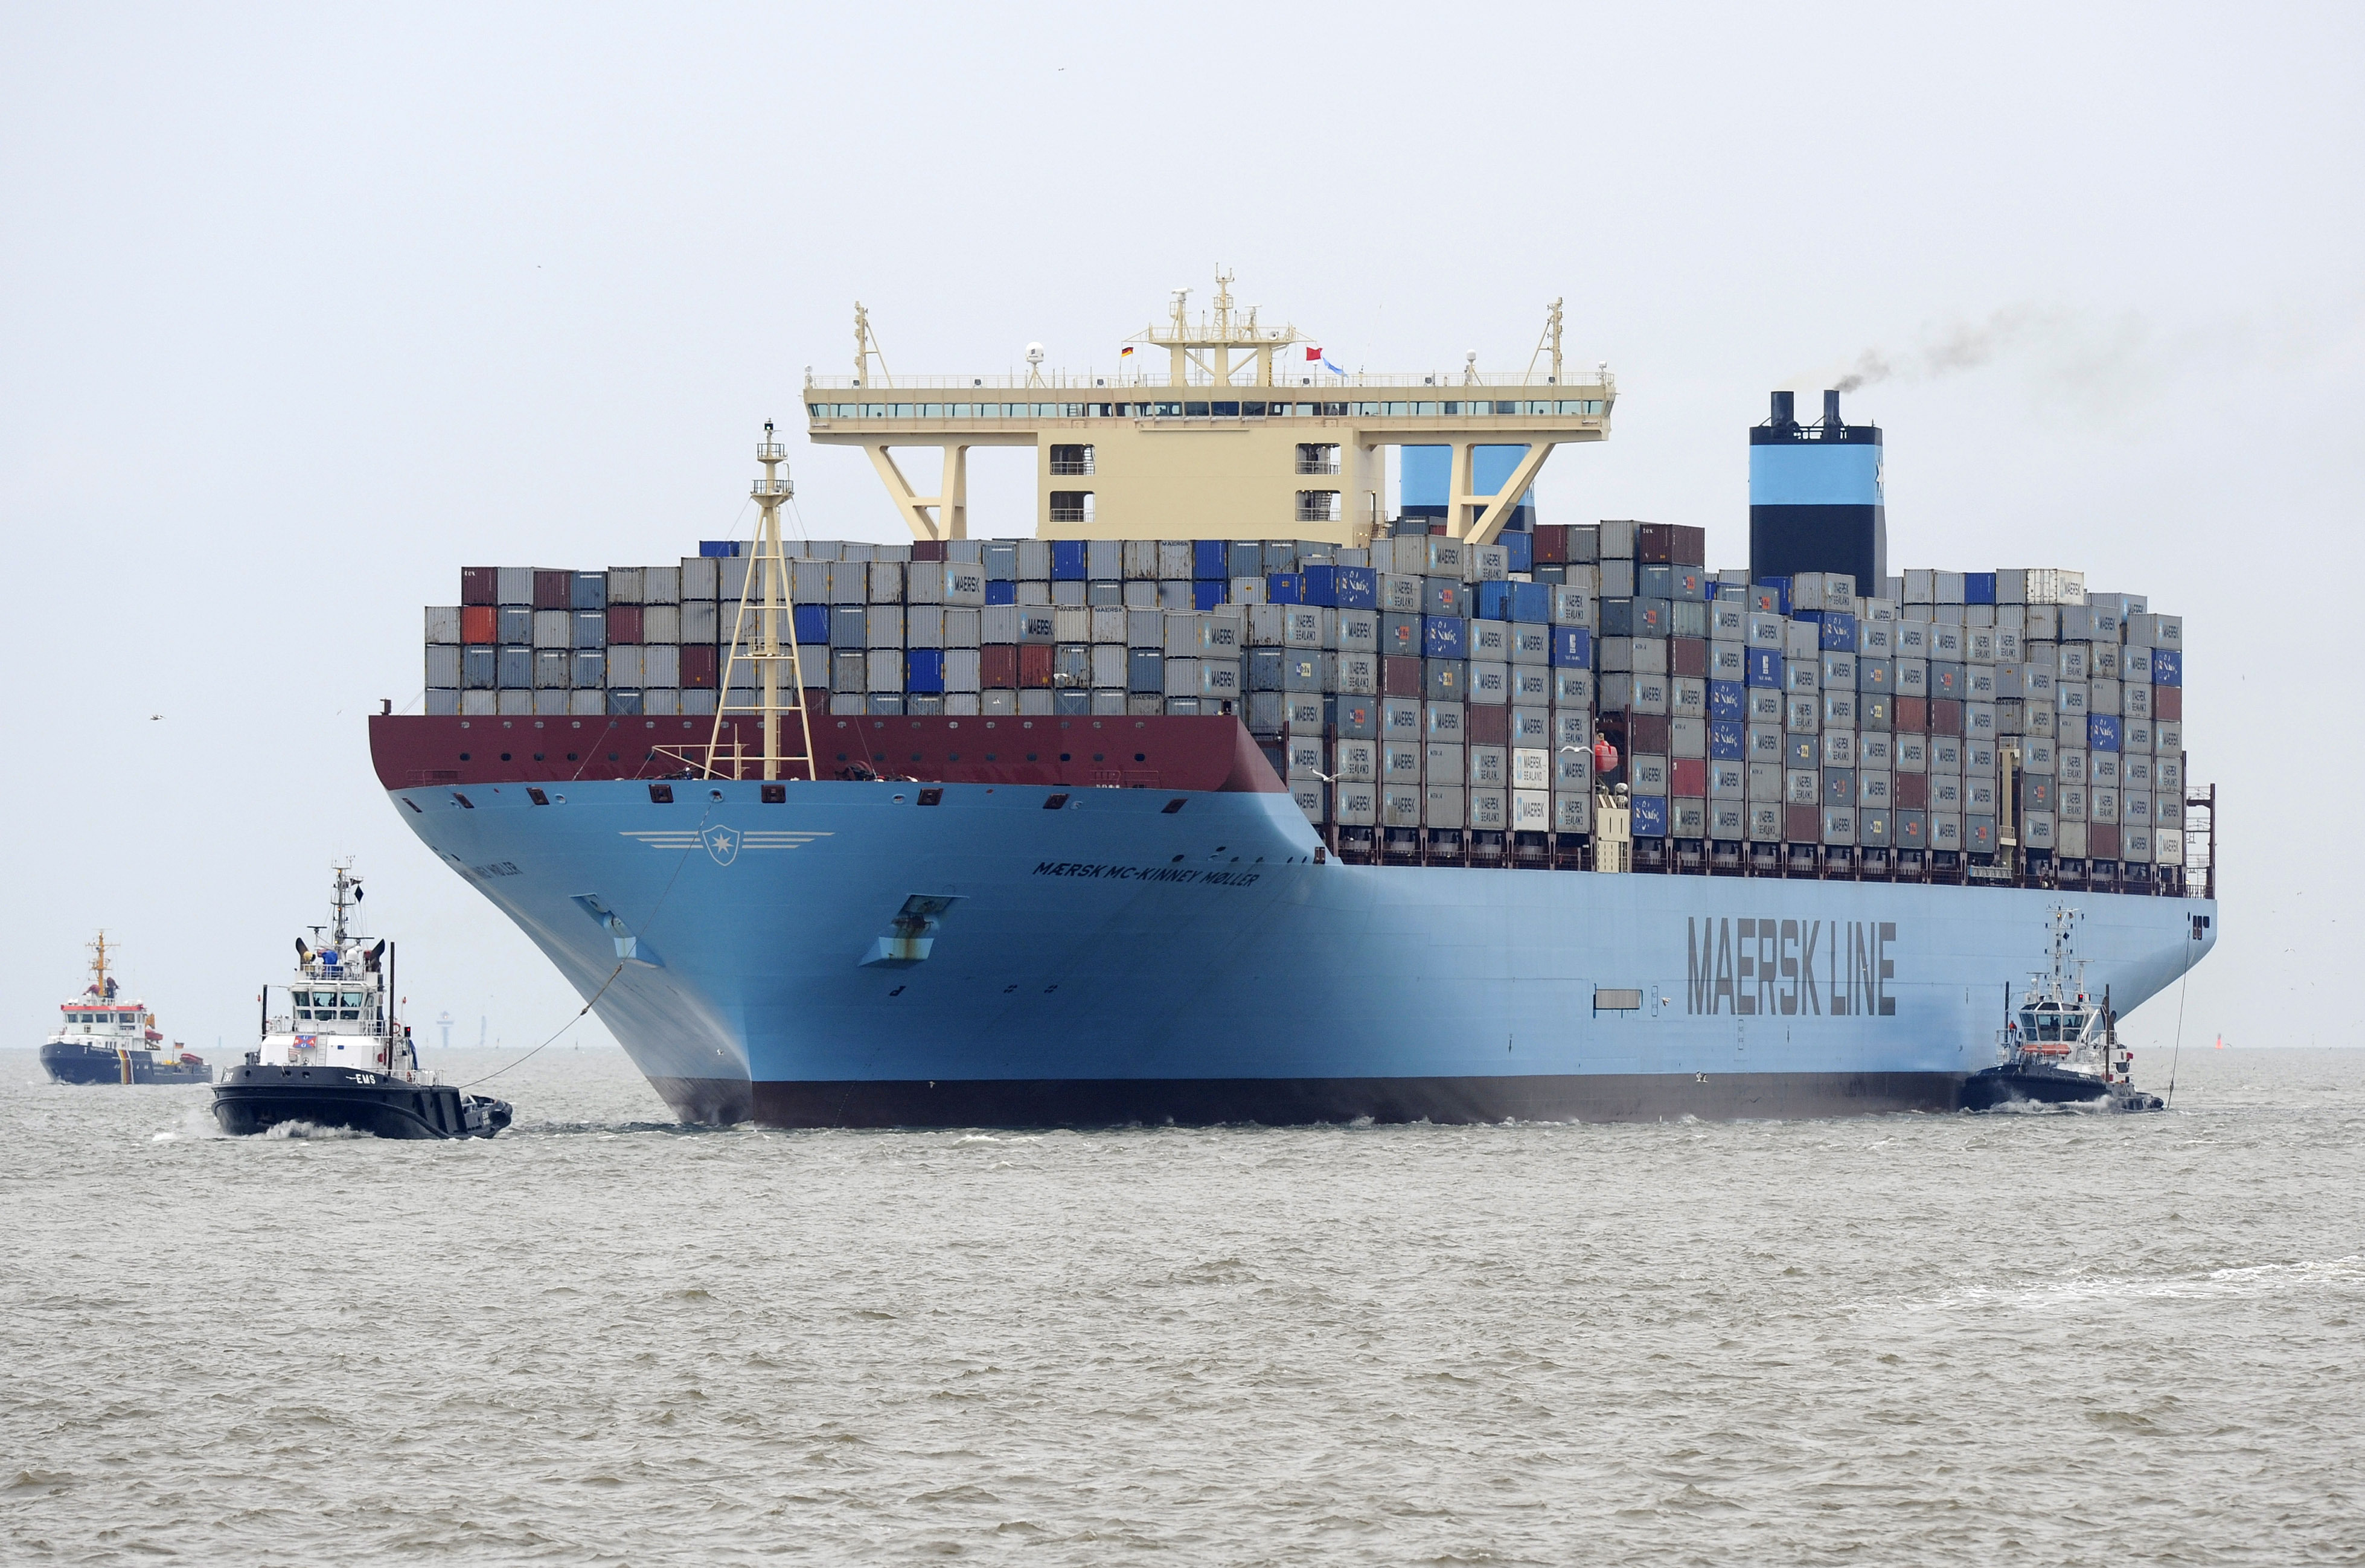 GERMANY-DENMARK-SKOREA-CARGO-SHIP-MAERSK